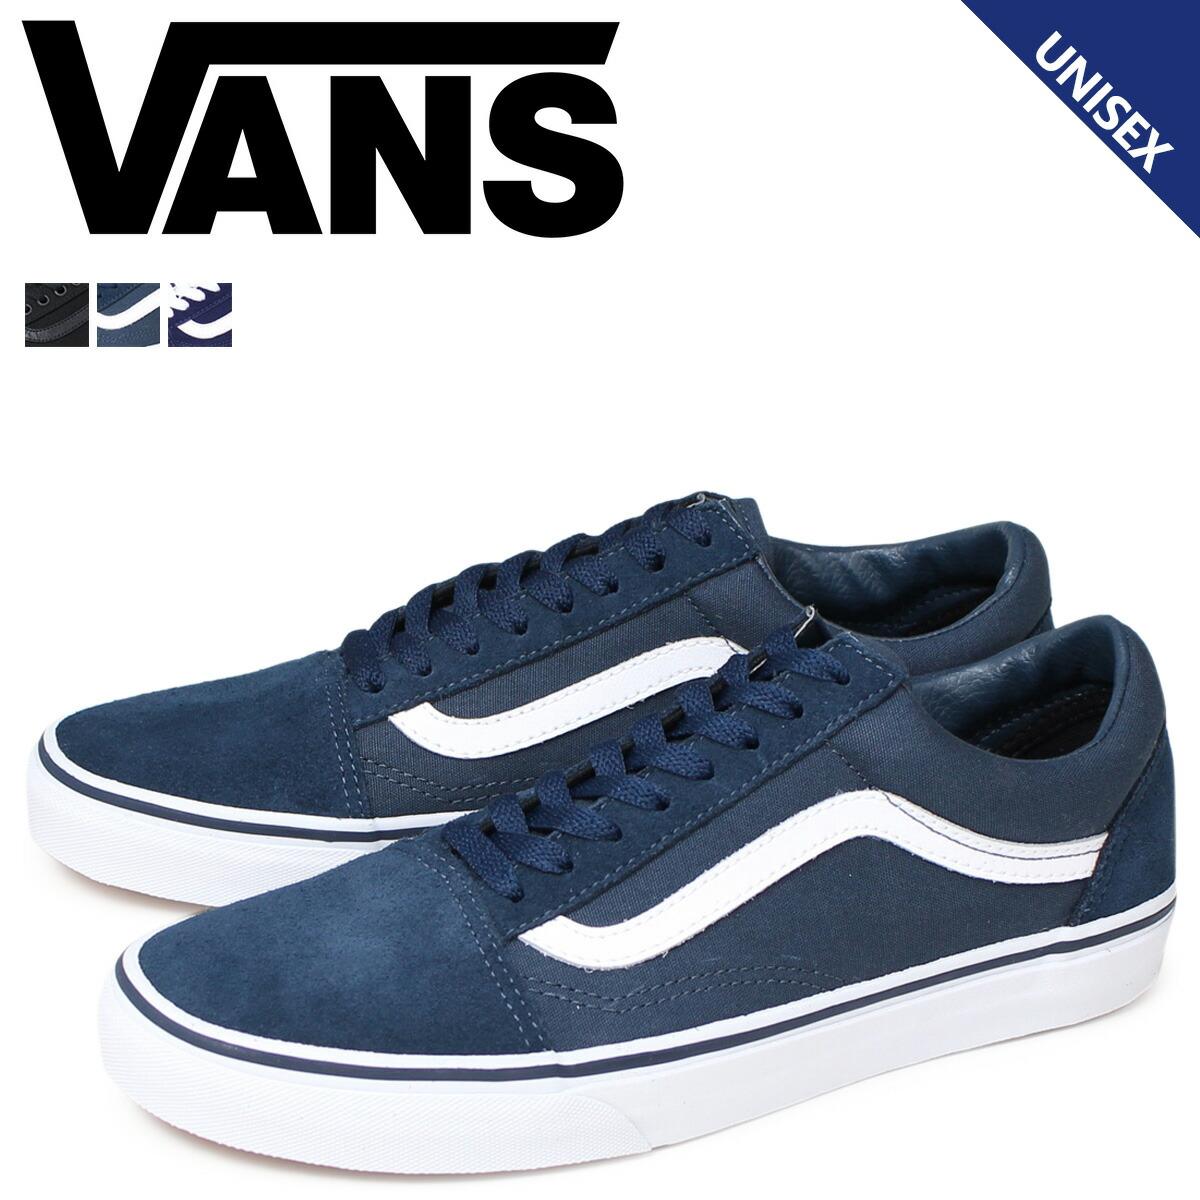 Vans Shoes Japan Popularity